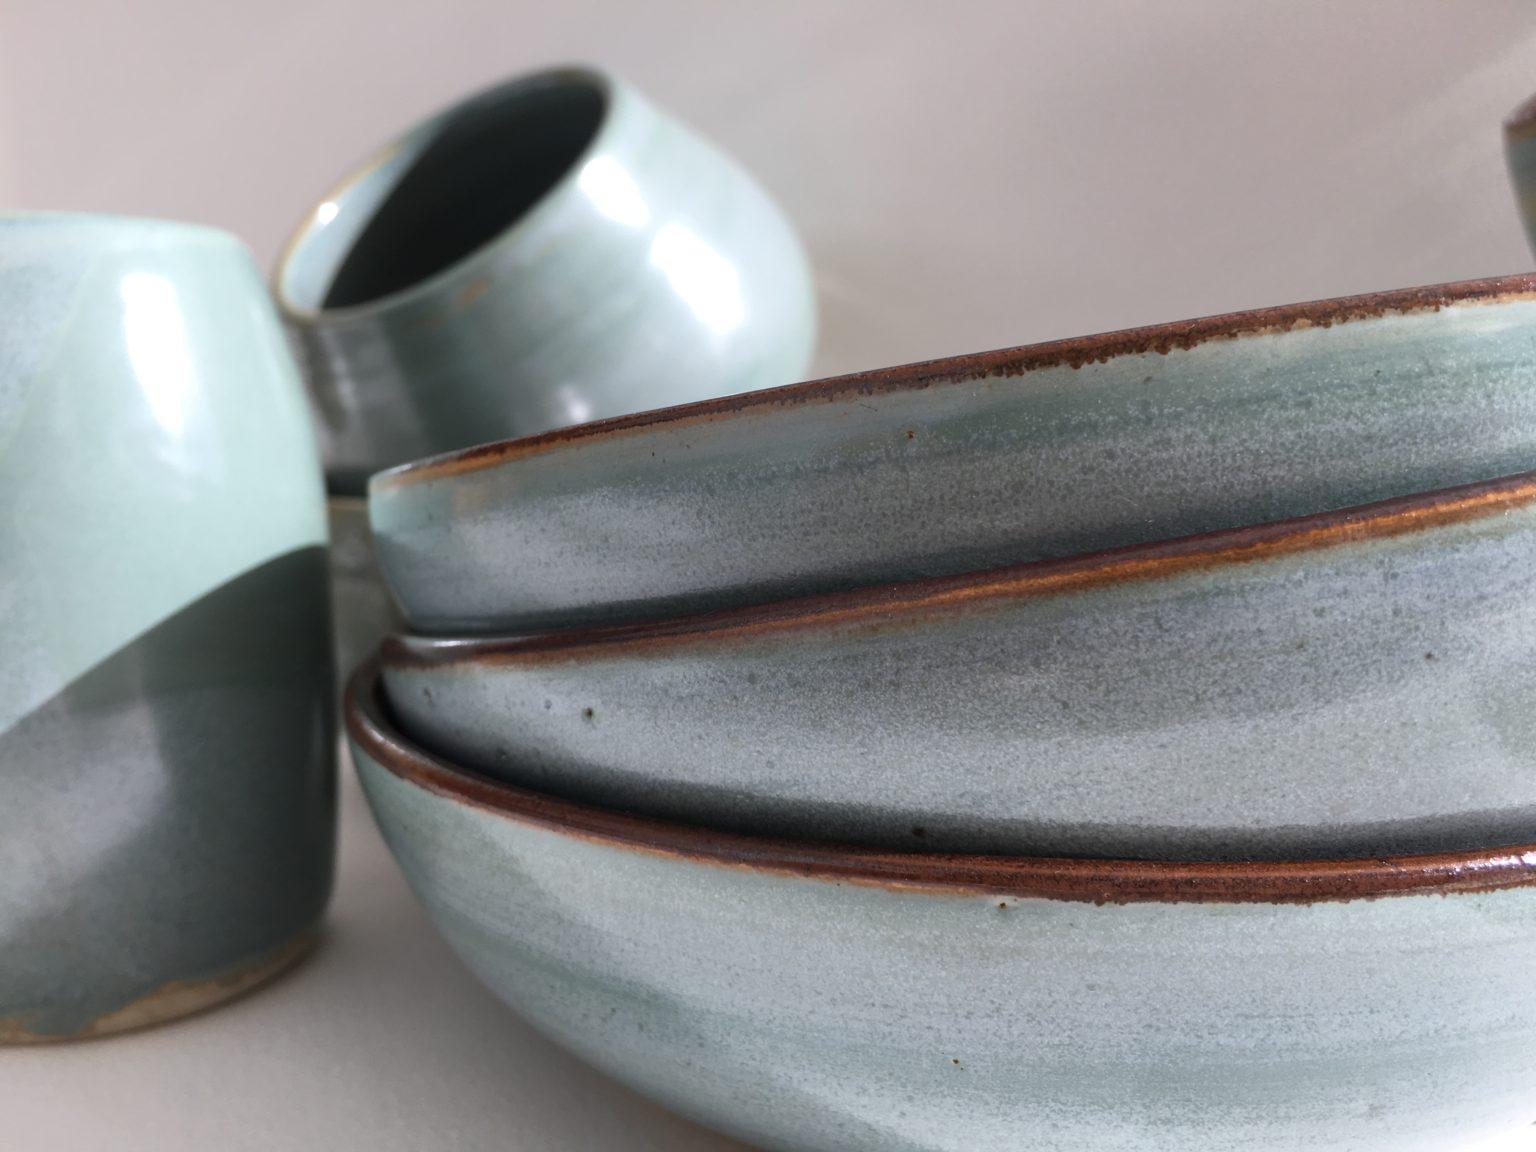 assiettes et mug céramique bleu ciel